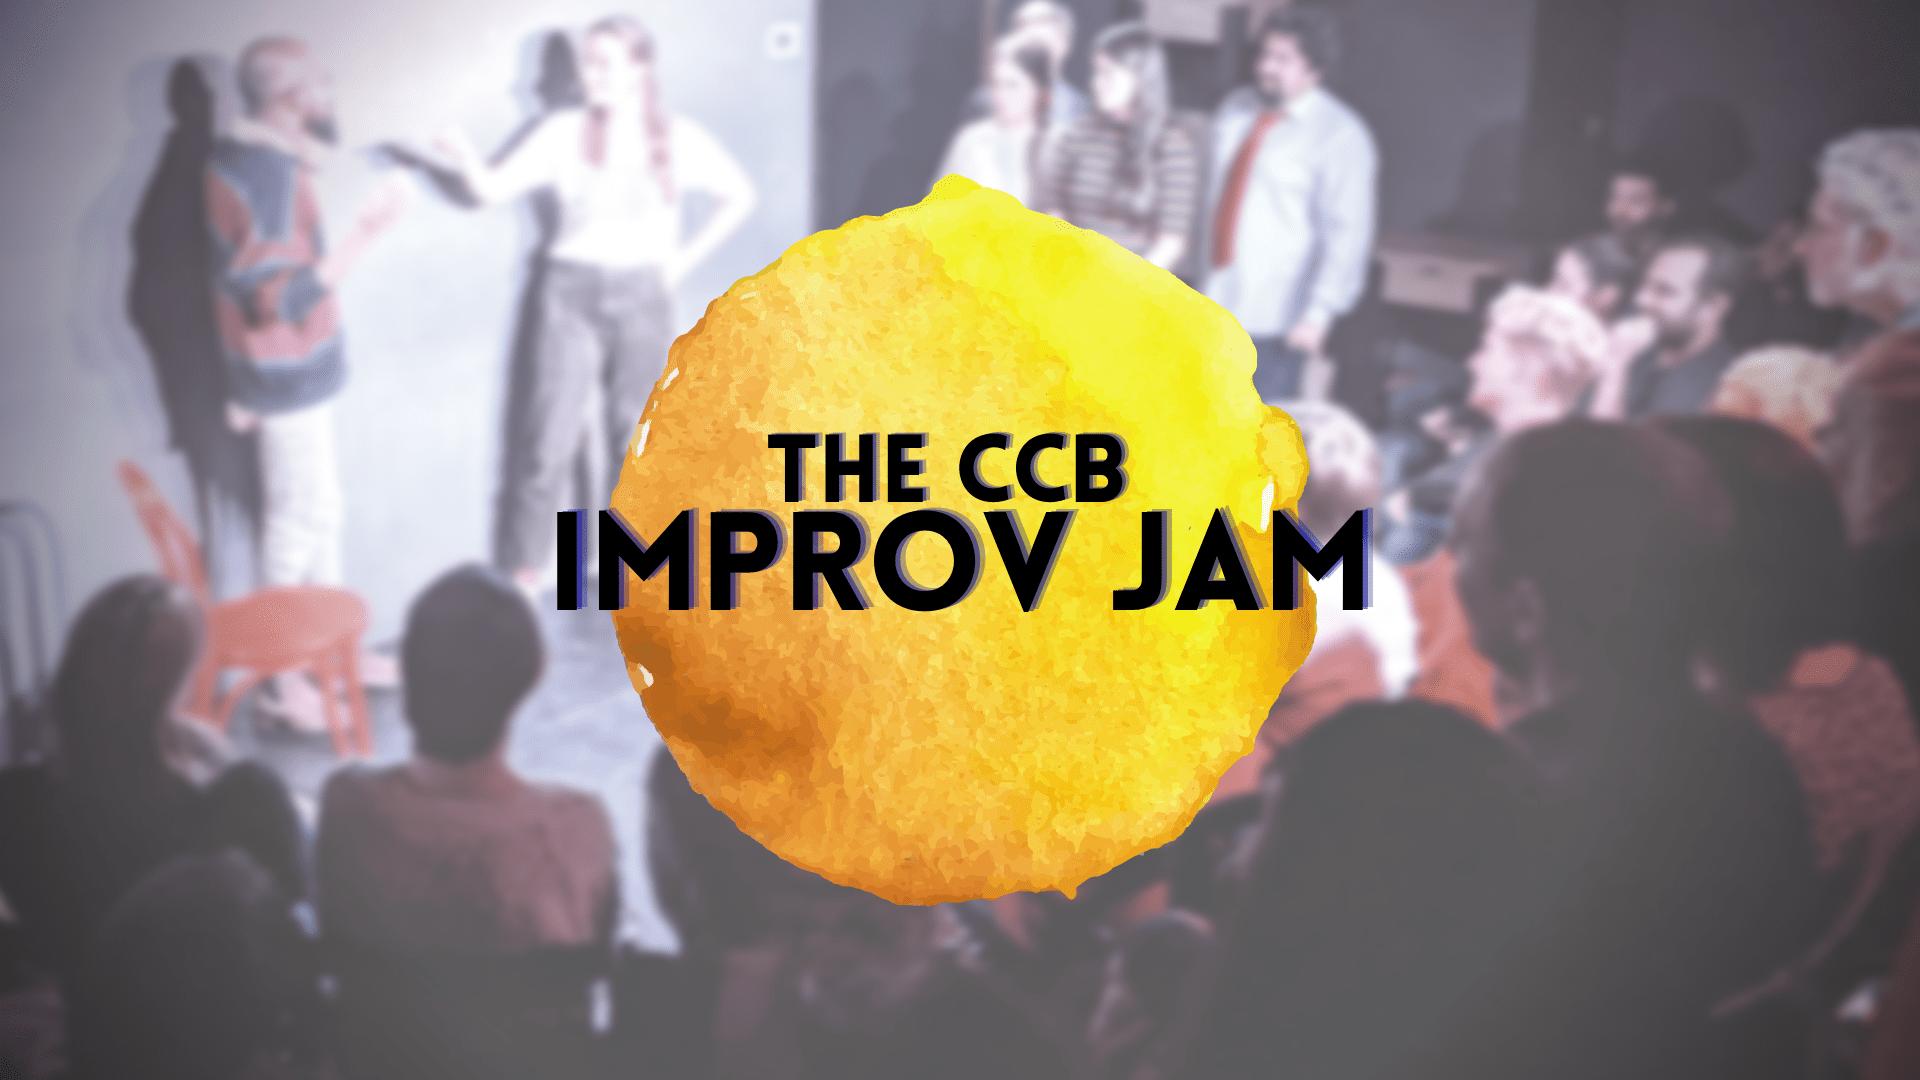 The CCB Improv Jam